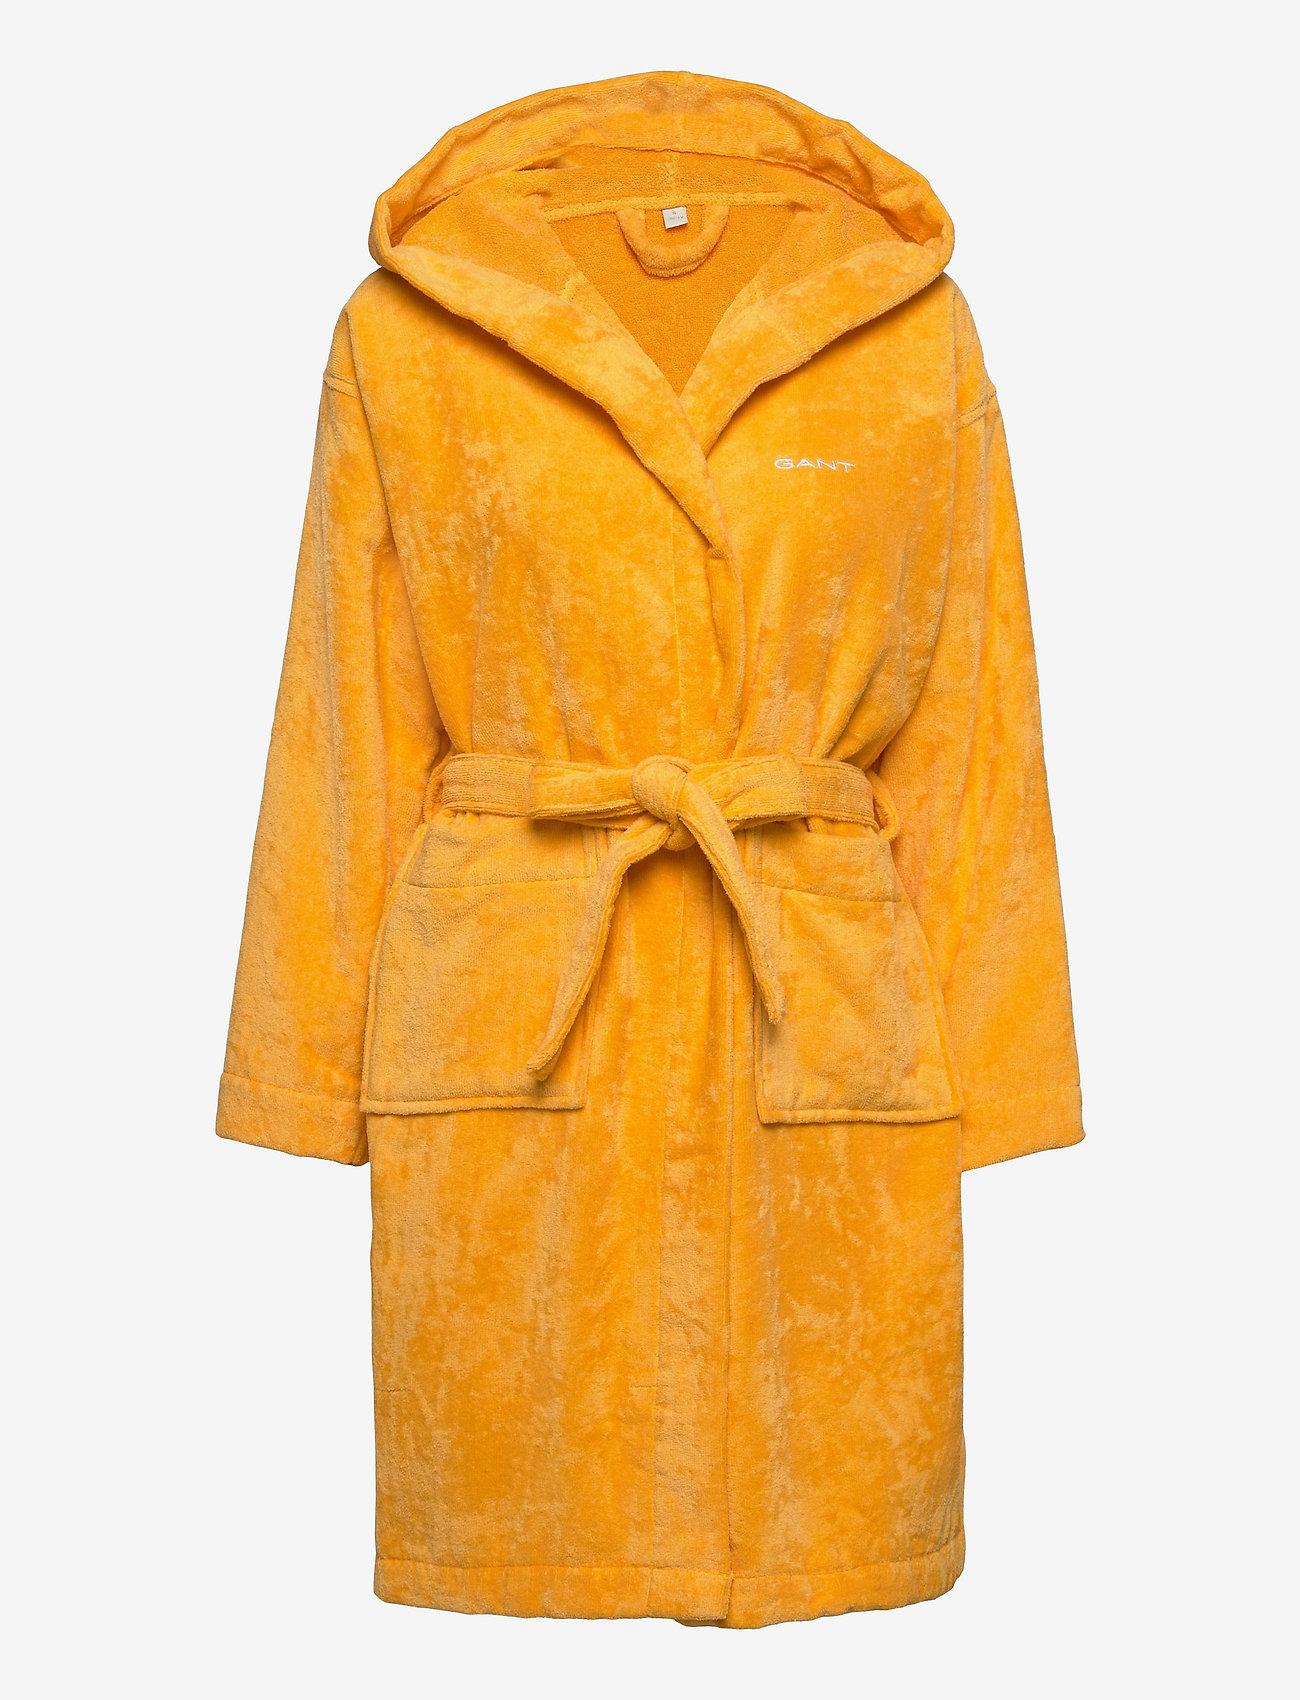 GANT - VACAY ROBE - sous-vêtements - mandarin orange - 0